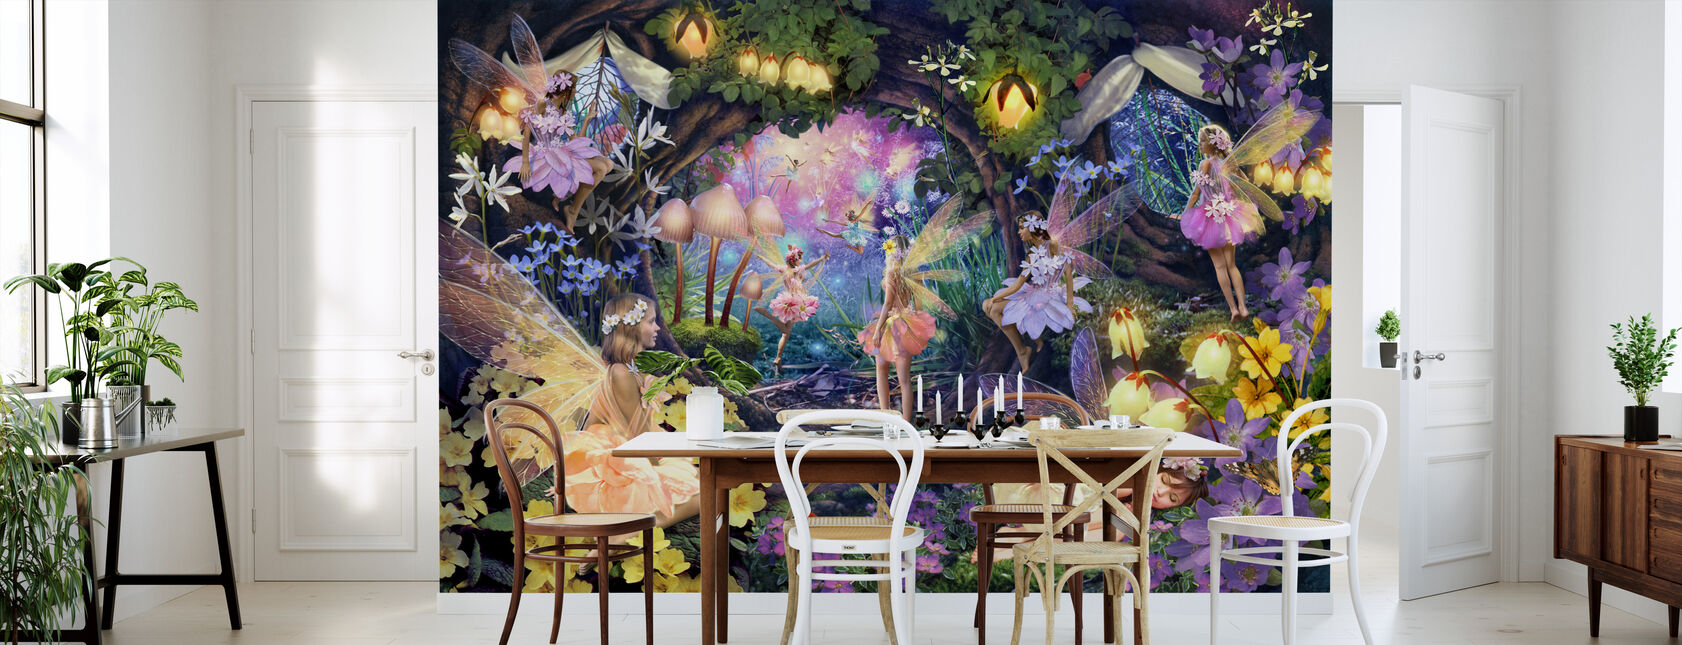 Fairy Hollow - Wallpaper - Kitchen